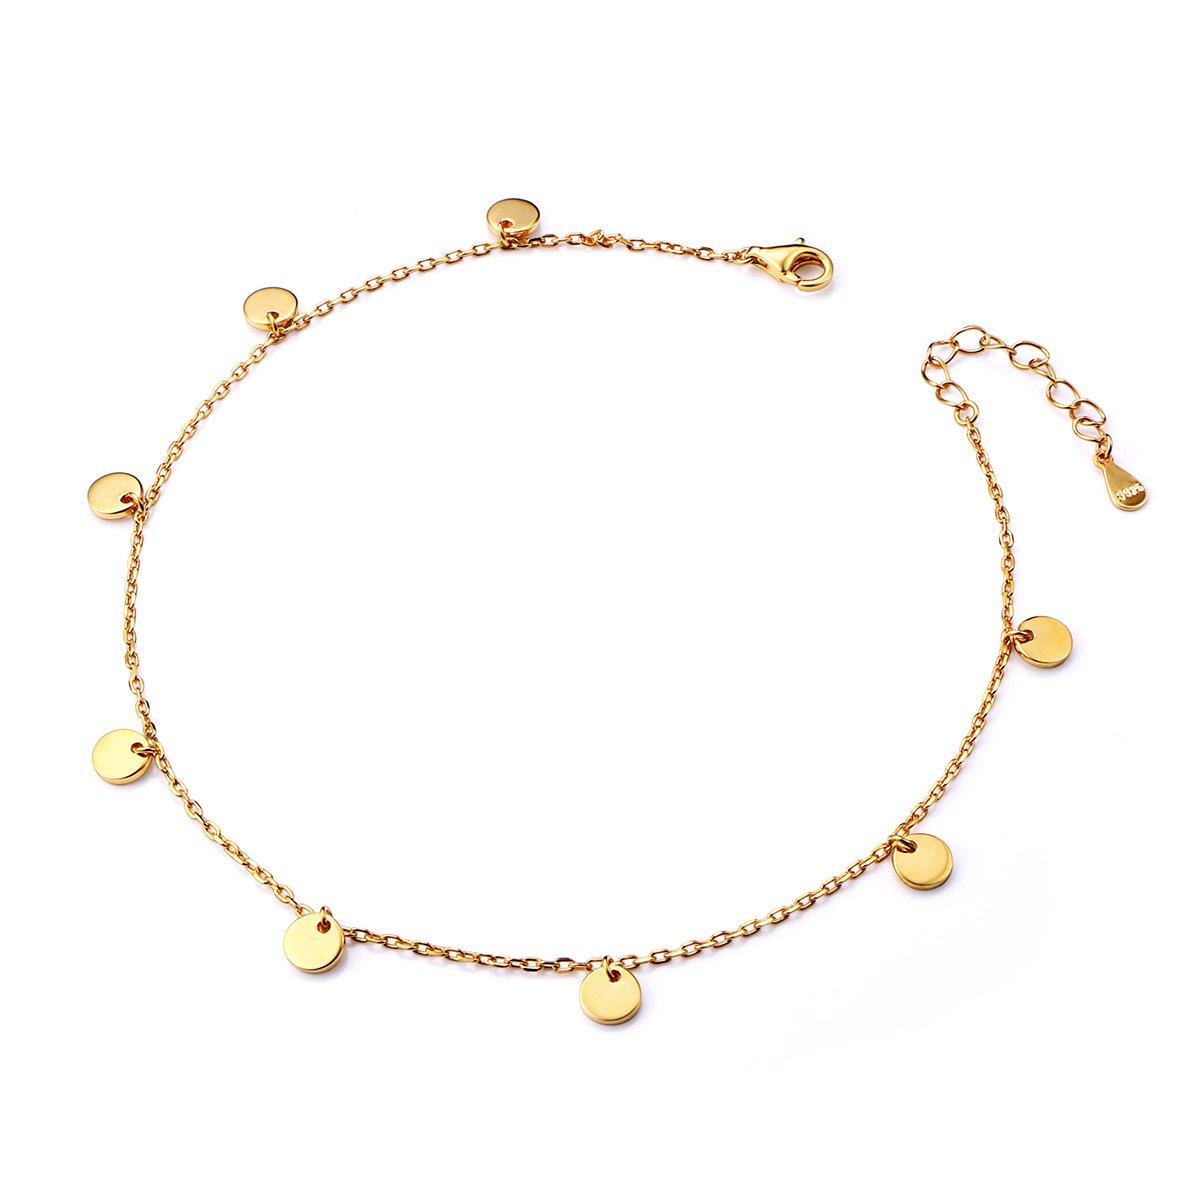 SILVER MOUNTAIN Boho Dot Disc Anklet for Women S925 Sterling Silver Adjustable Foot Ankle bracelet Golden